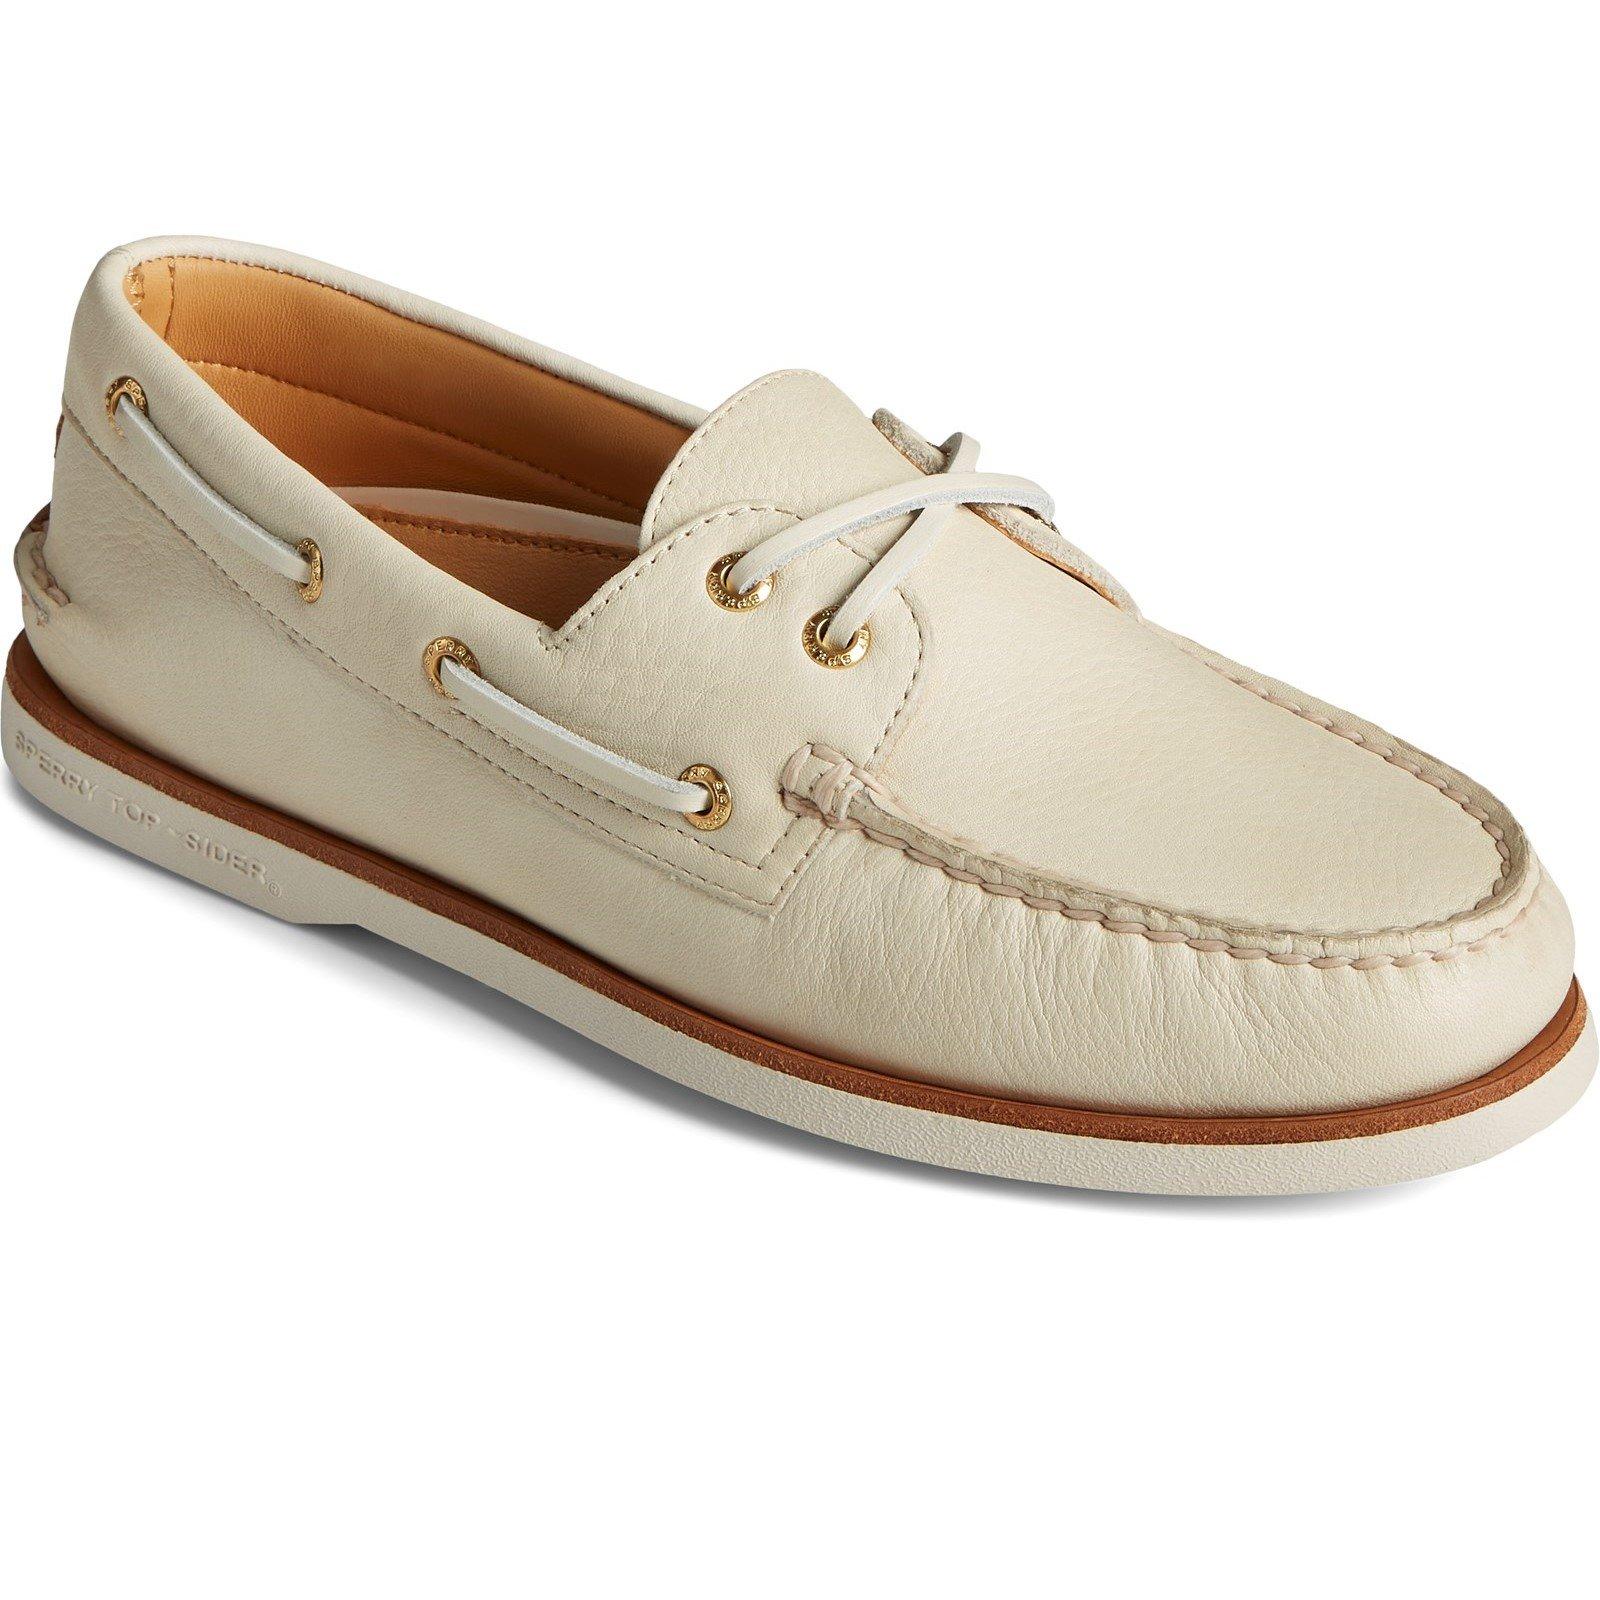 Sperry Men's A/O 2-Eye Boat Shoe Various Colours 32926 - Cream 10